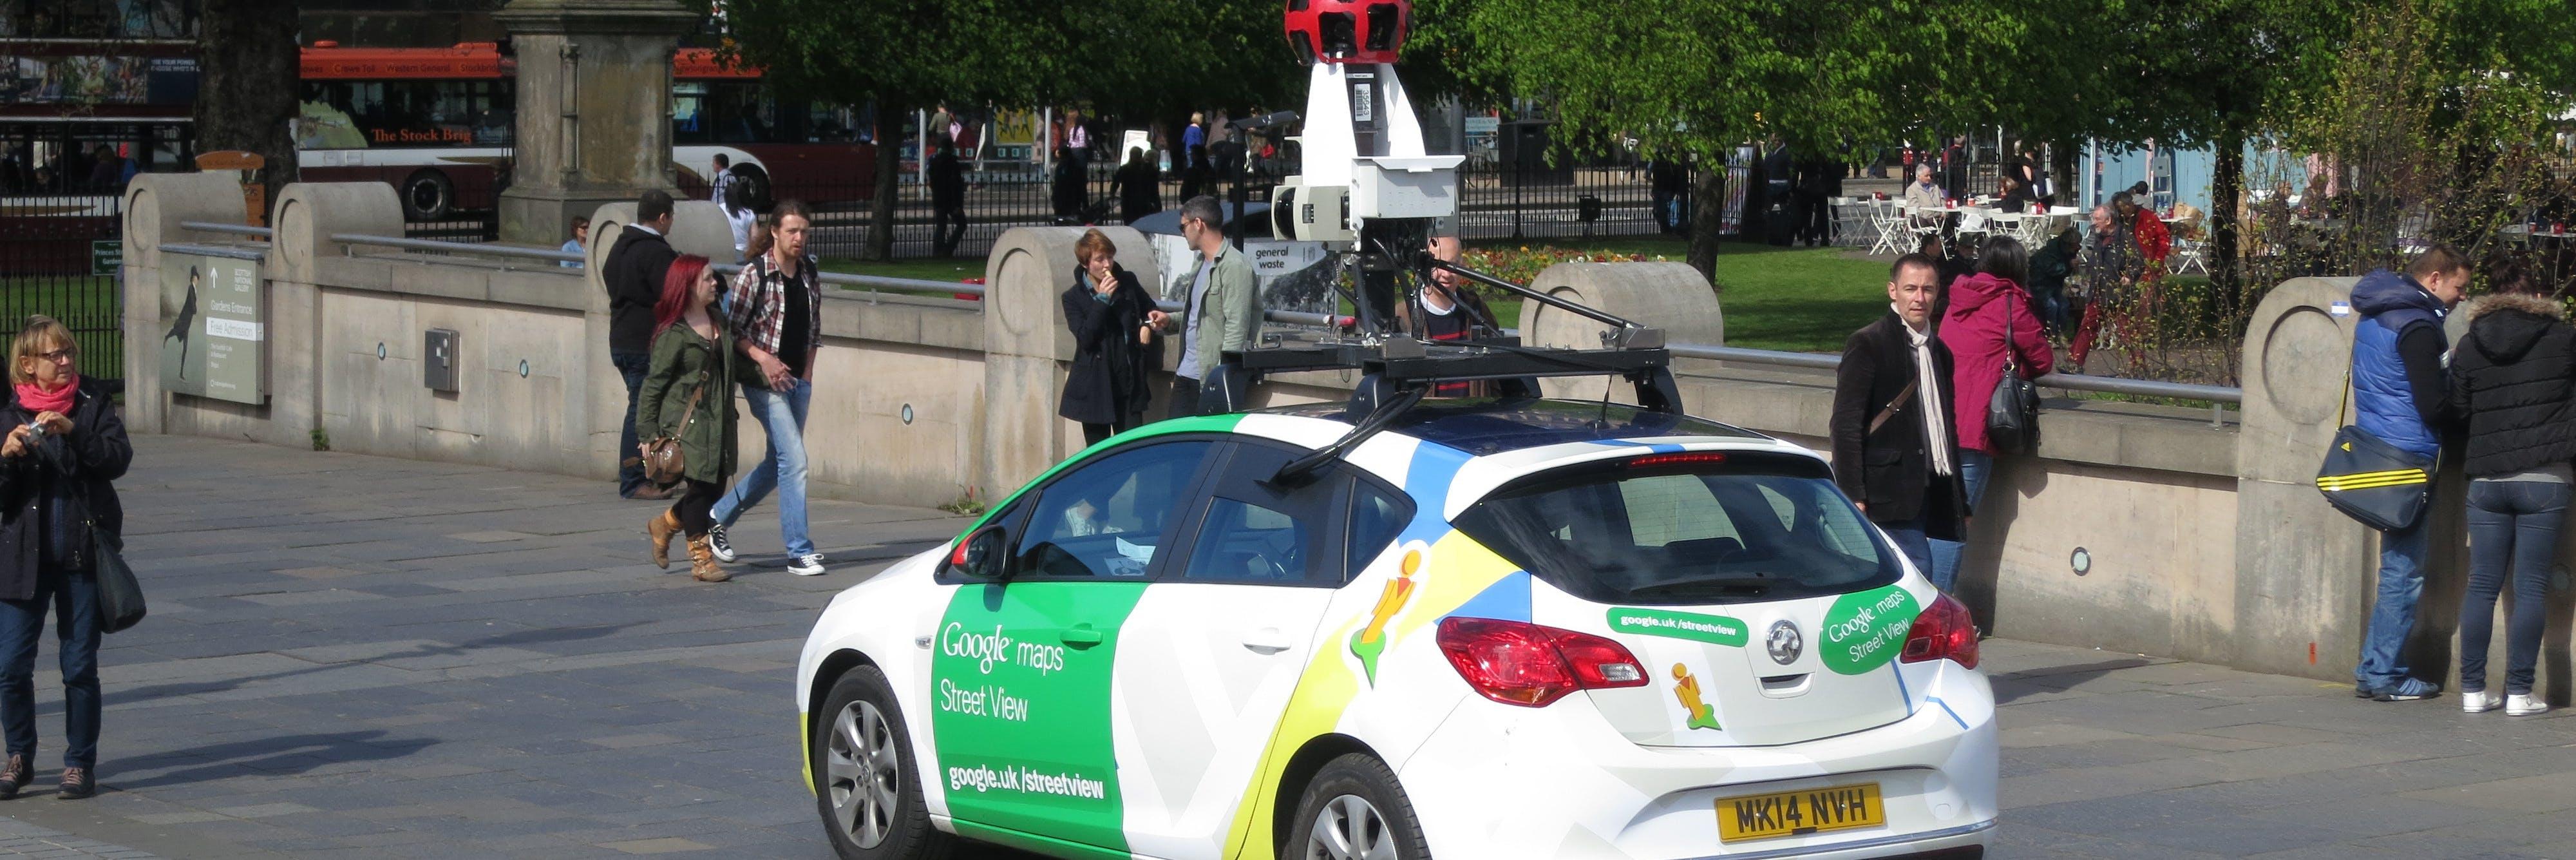 A Google Street View car driving around Edinburgh.